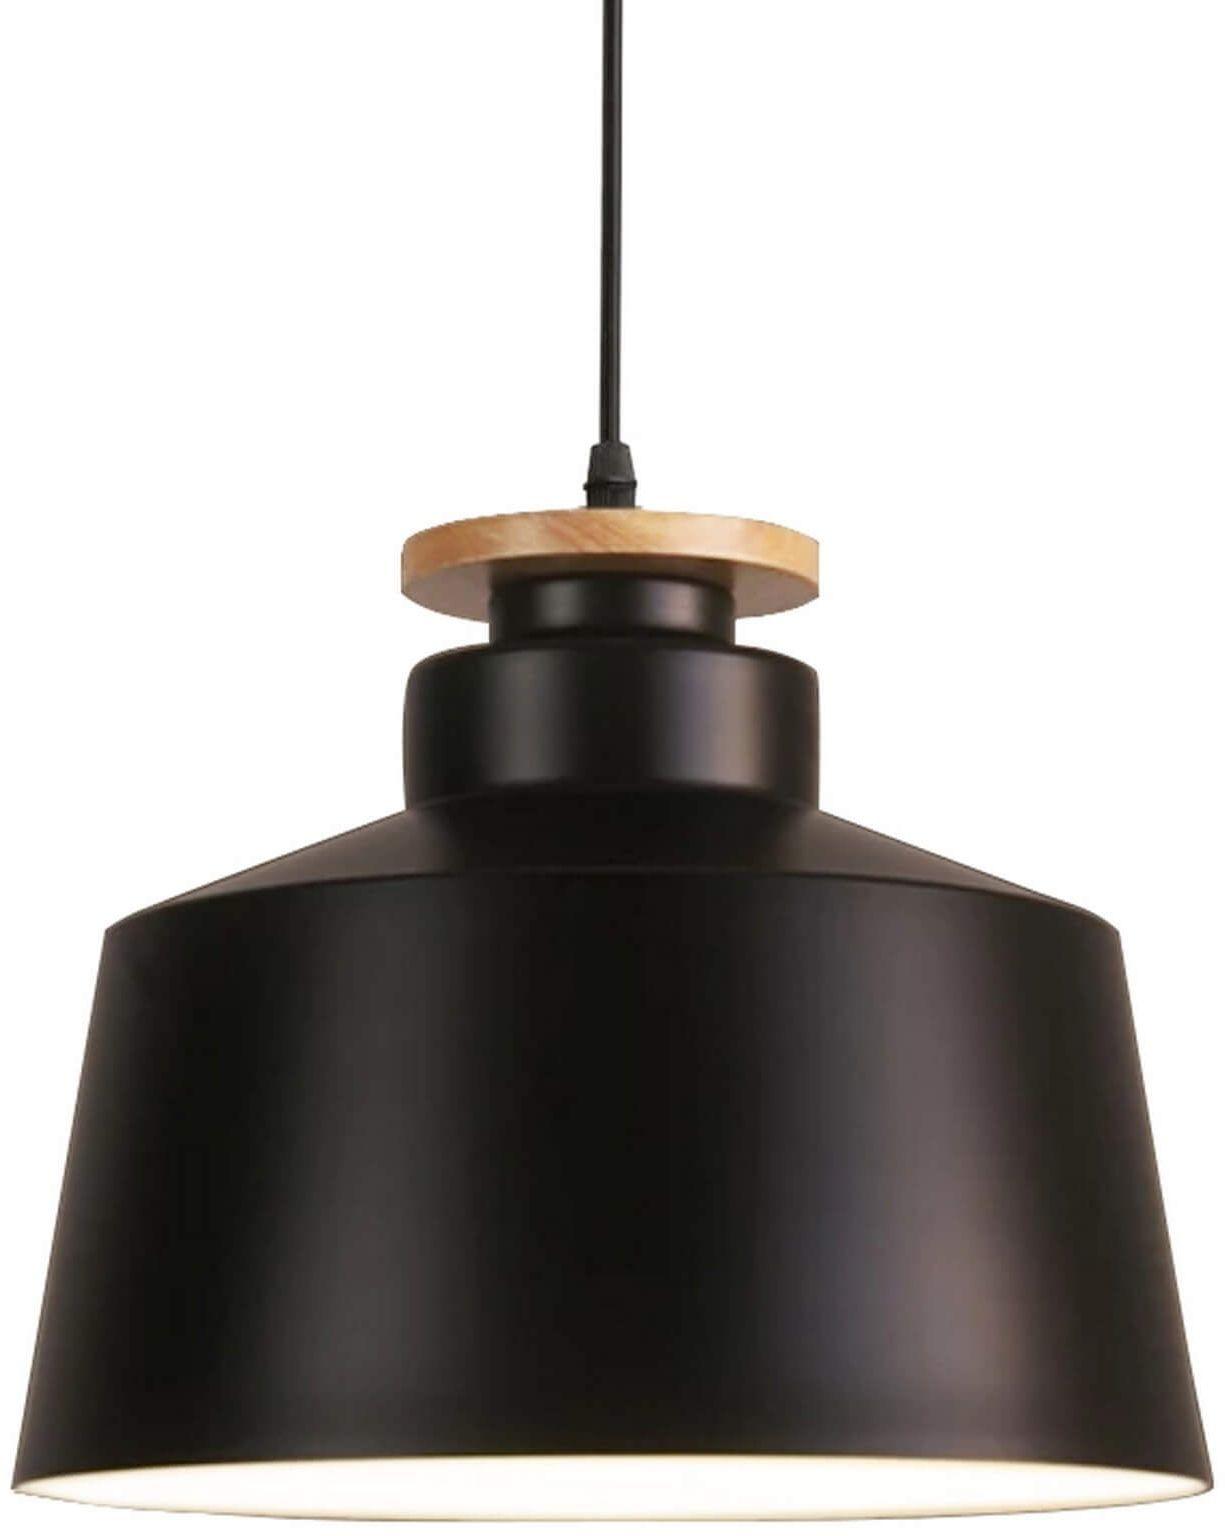 NOWOCZESNA LAMPA WISZĄCA CZARNA LEVANTI D30